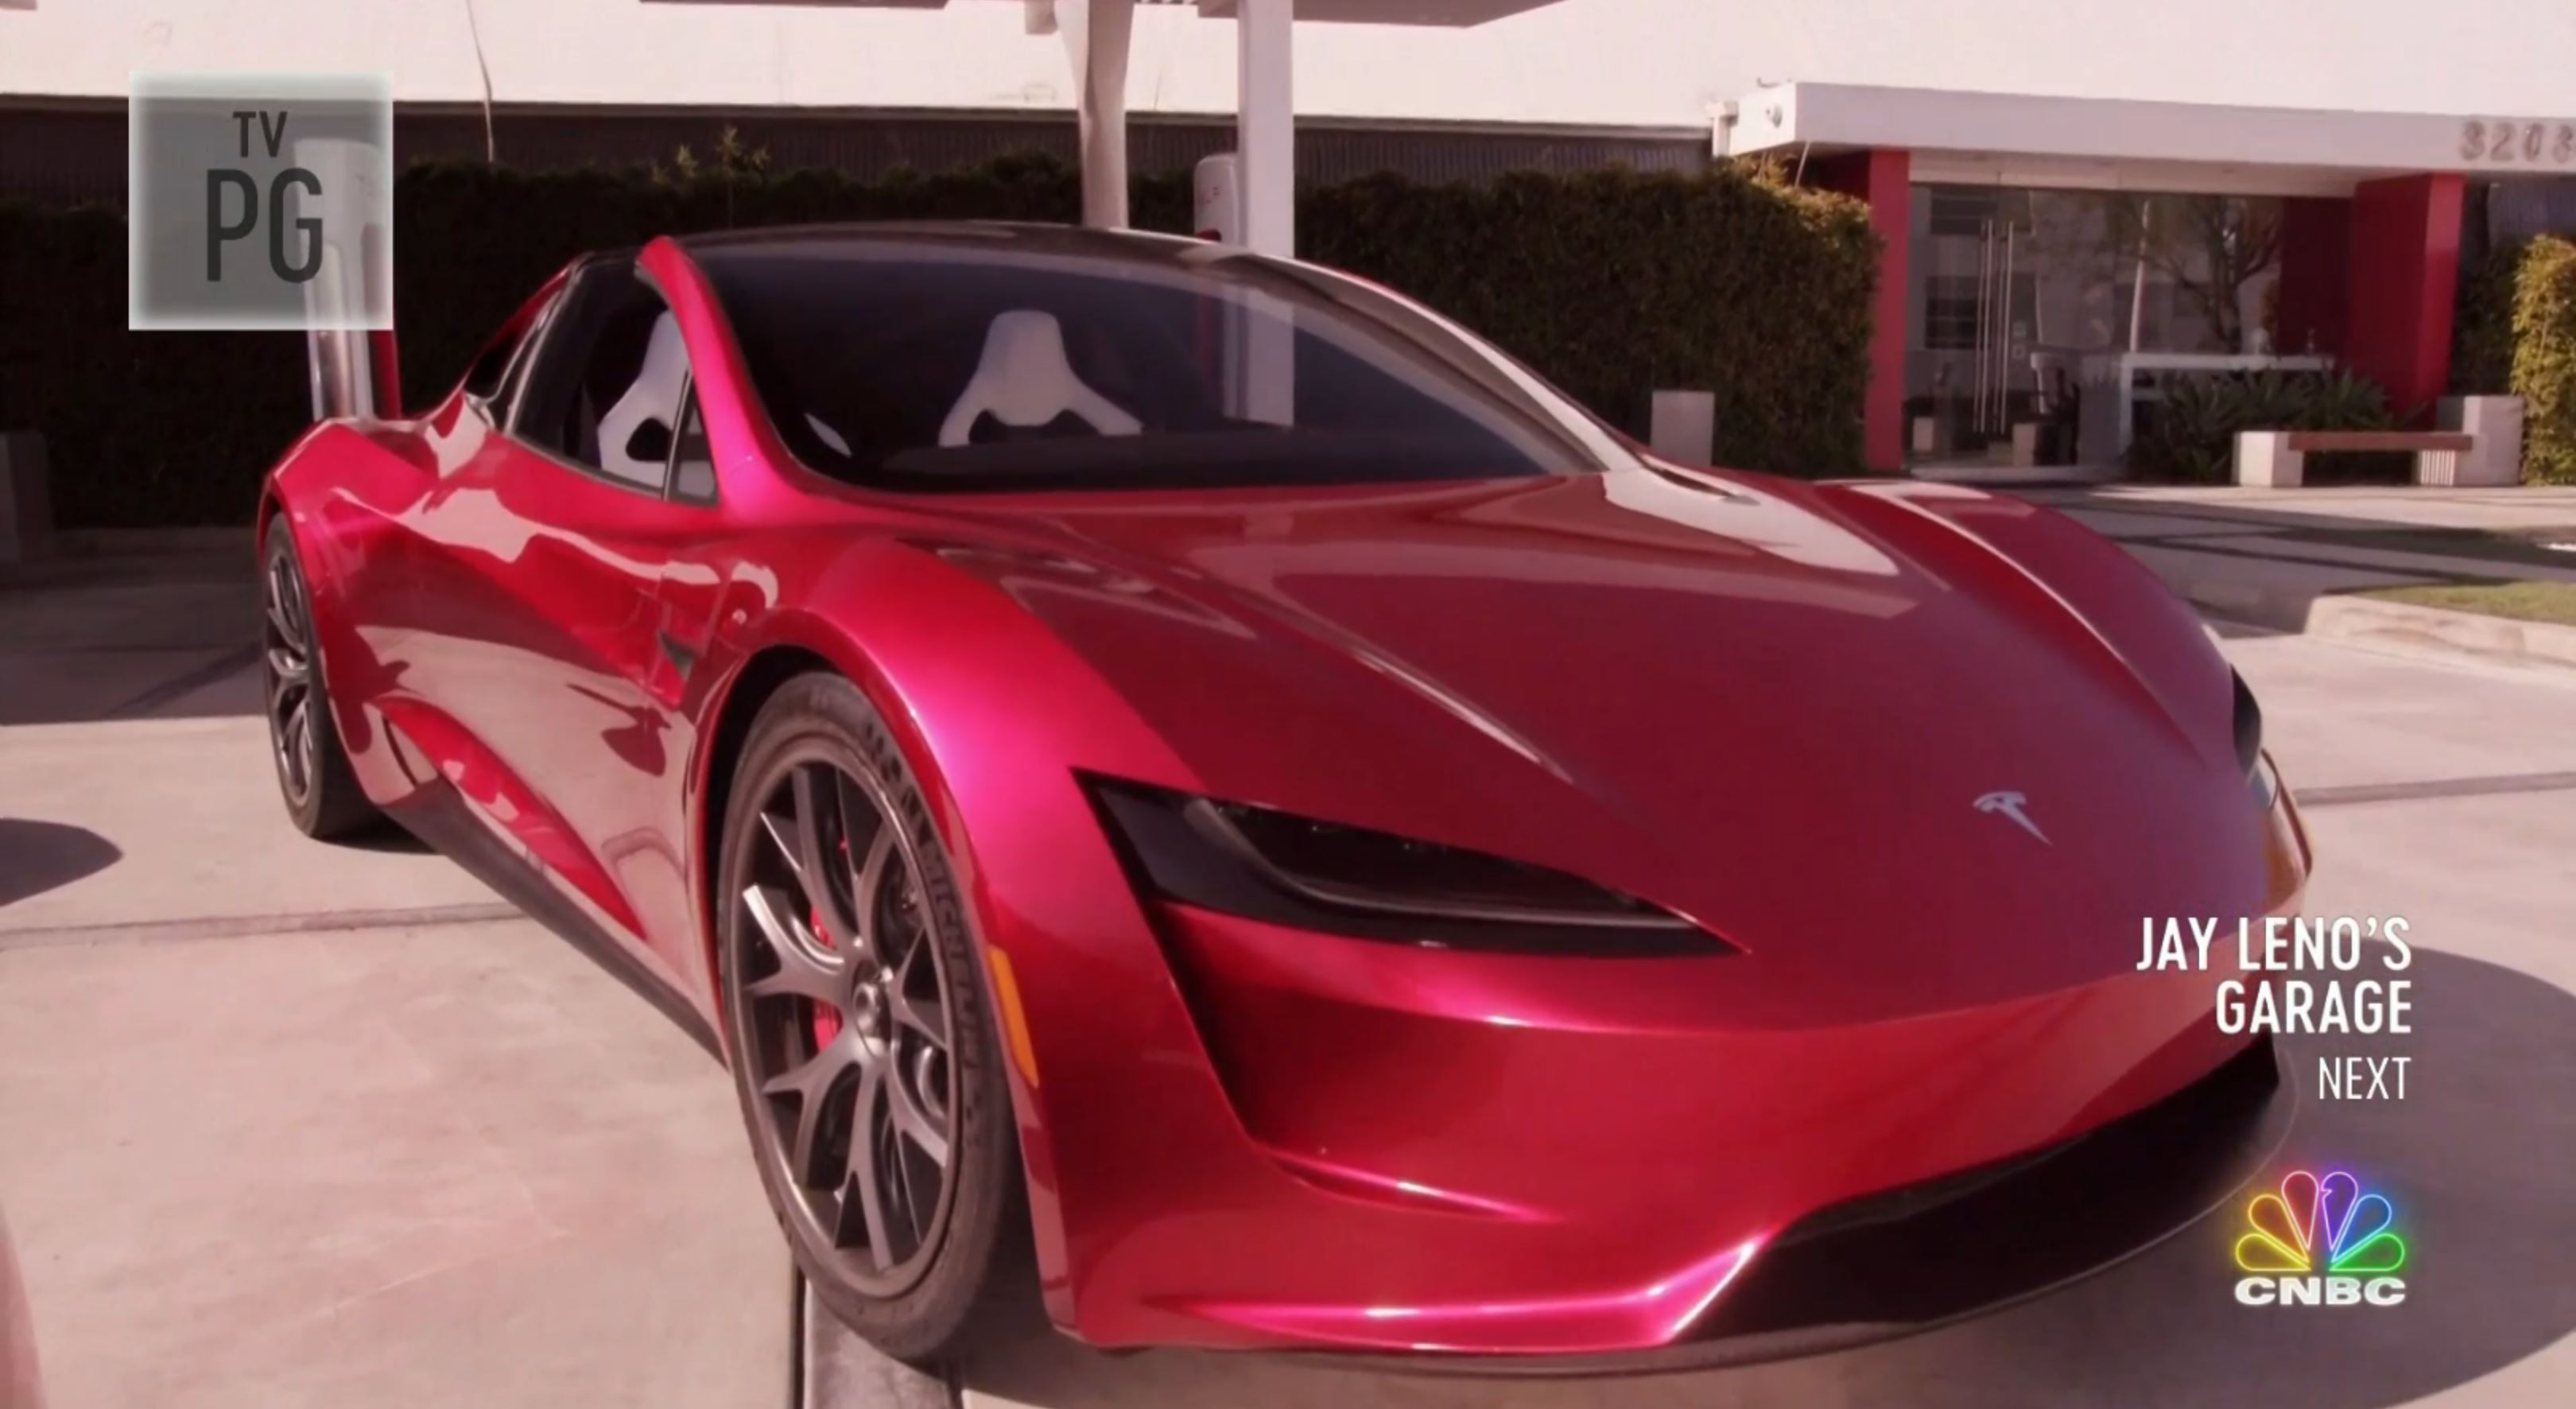 Jay Leno Tesla Franz segment (NBC) 8